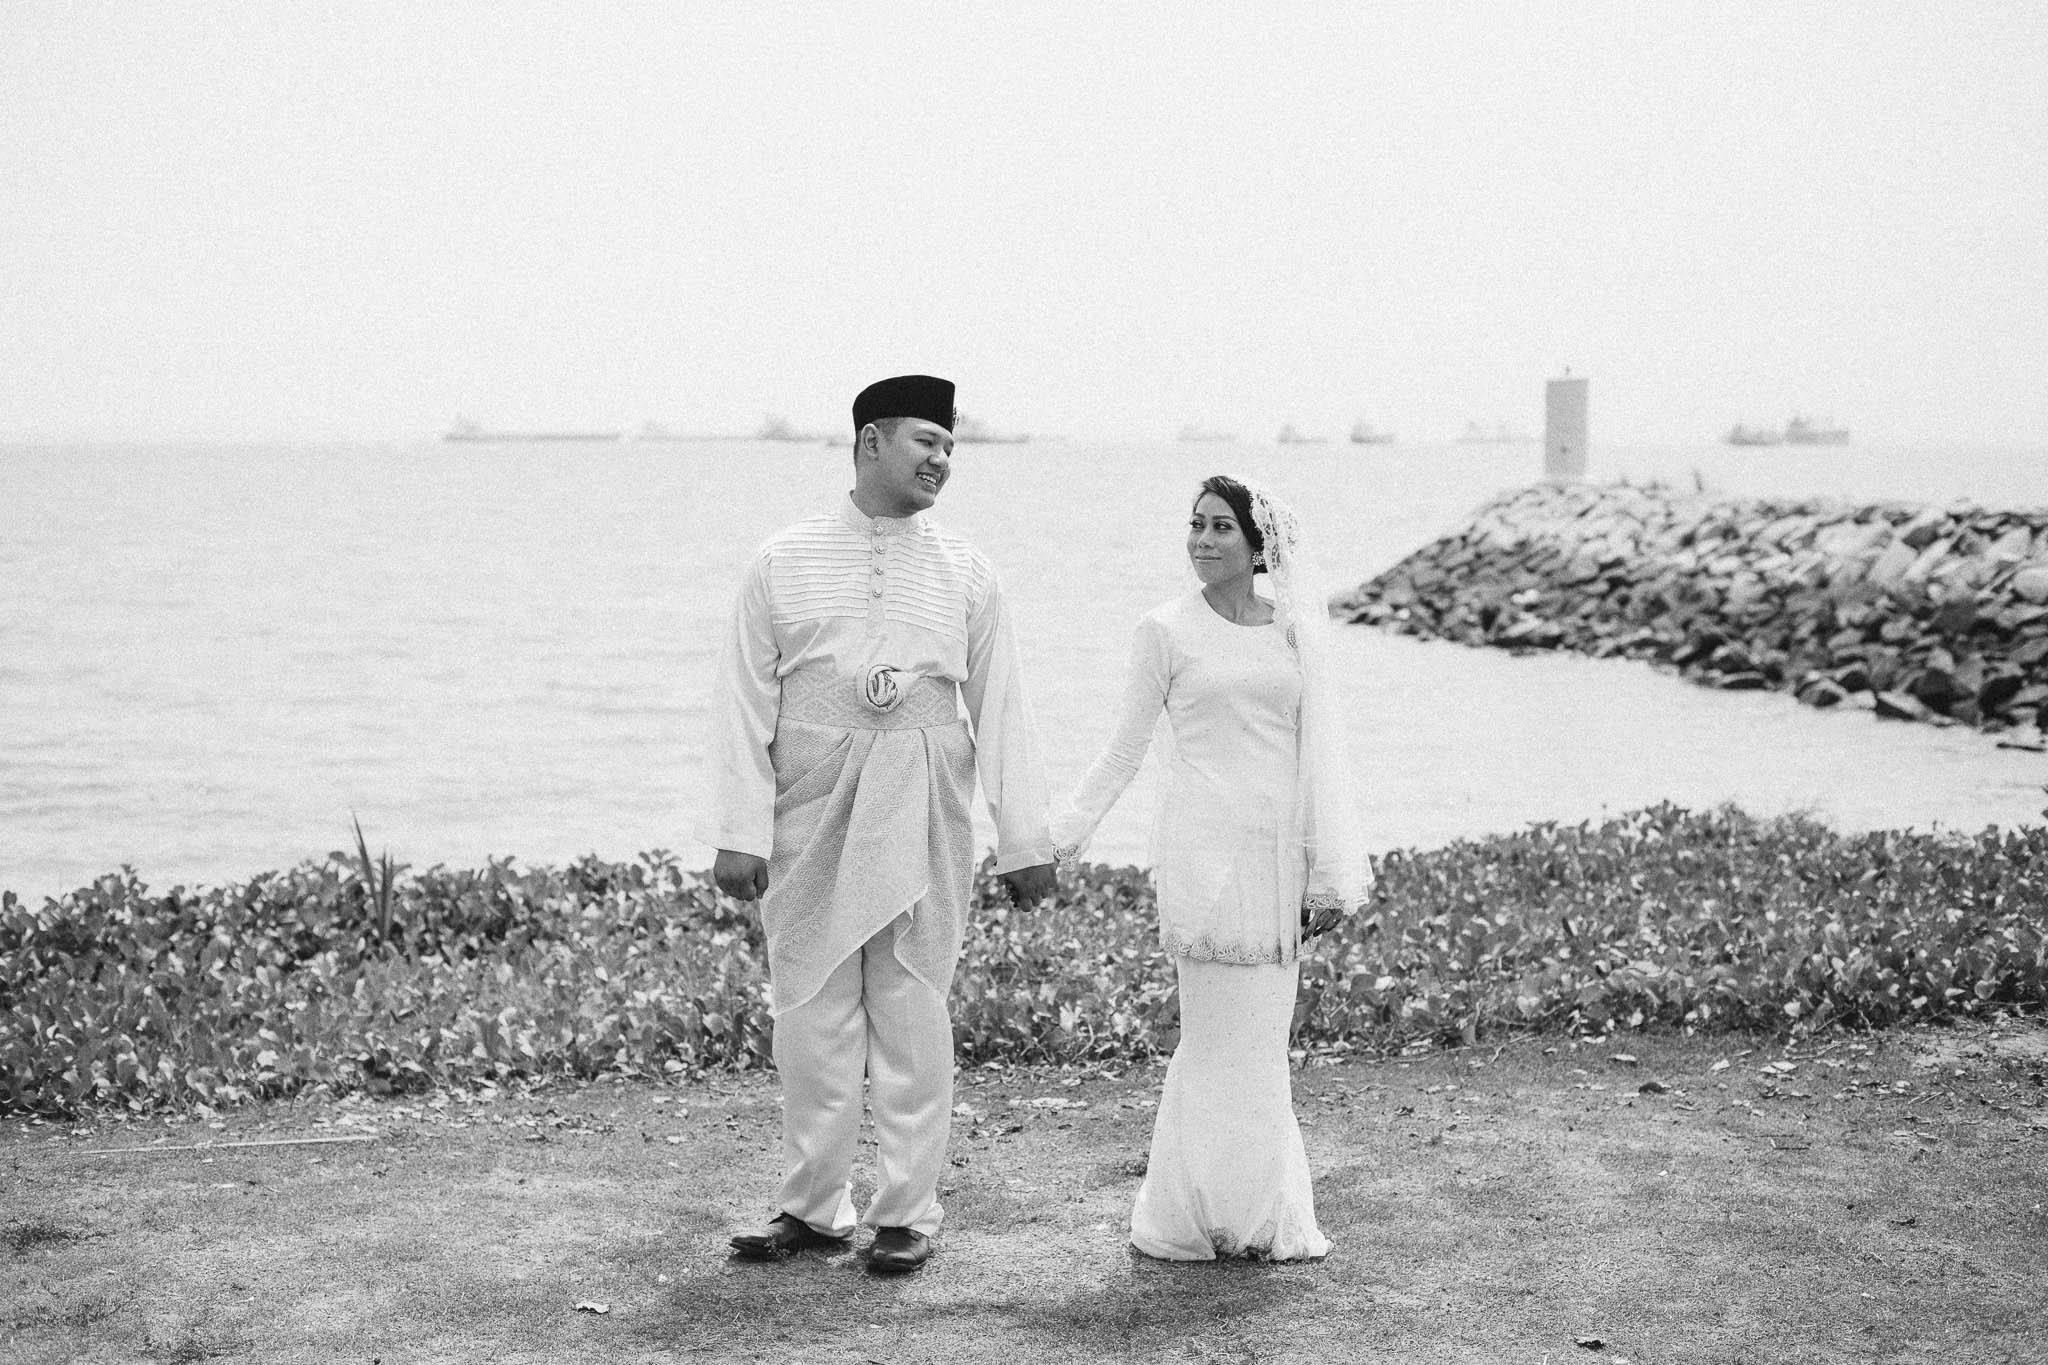 singapore-wedding-photographer-malay-indian-pre-wedding-travel-wmt-2015-71.jpg